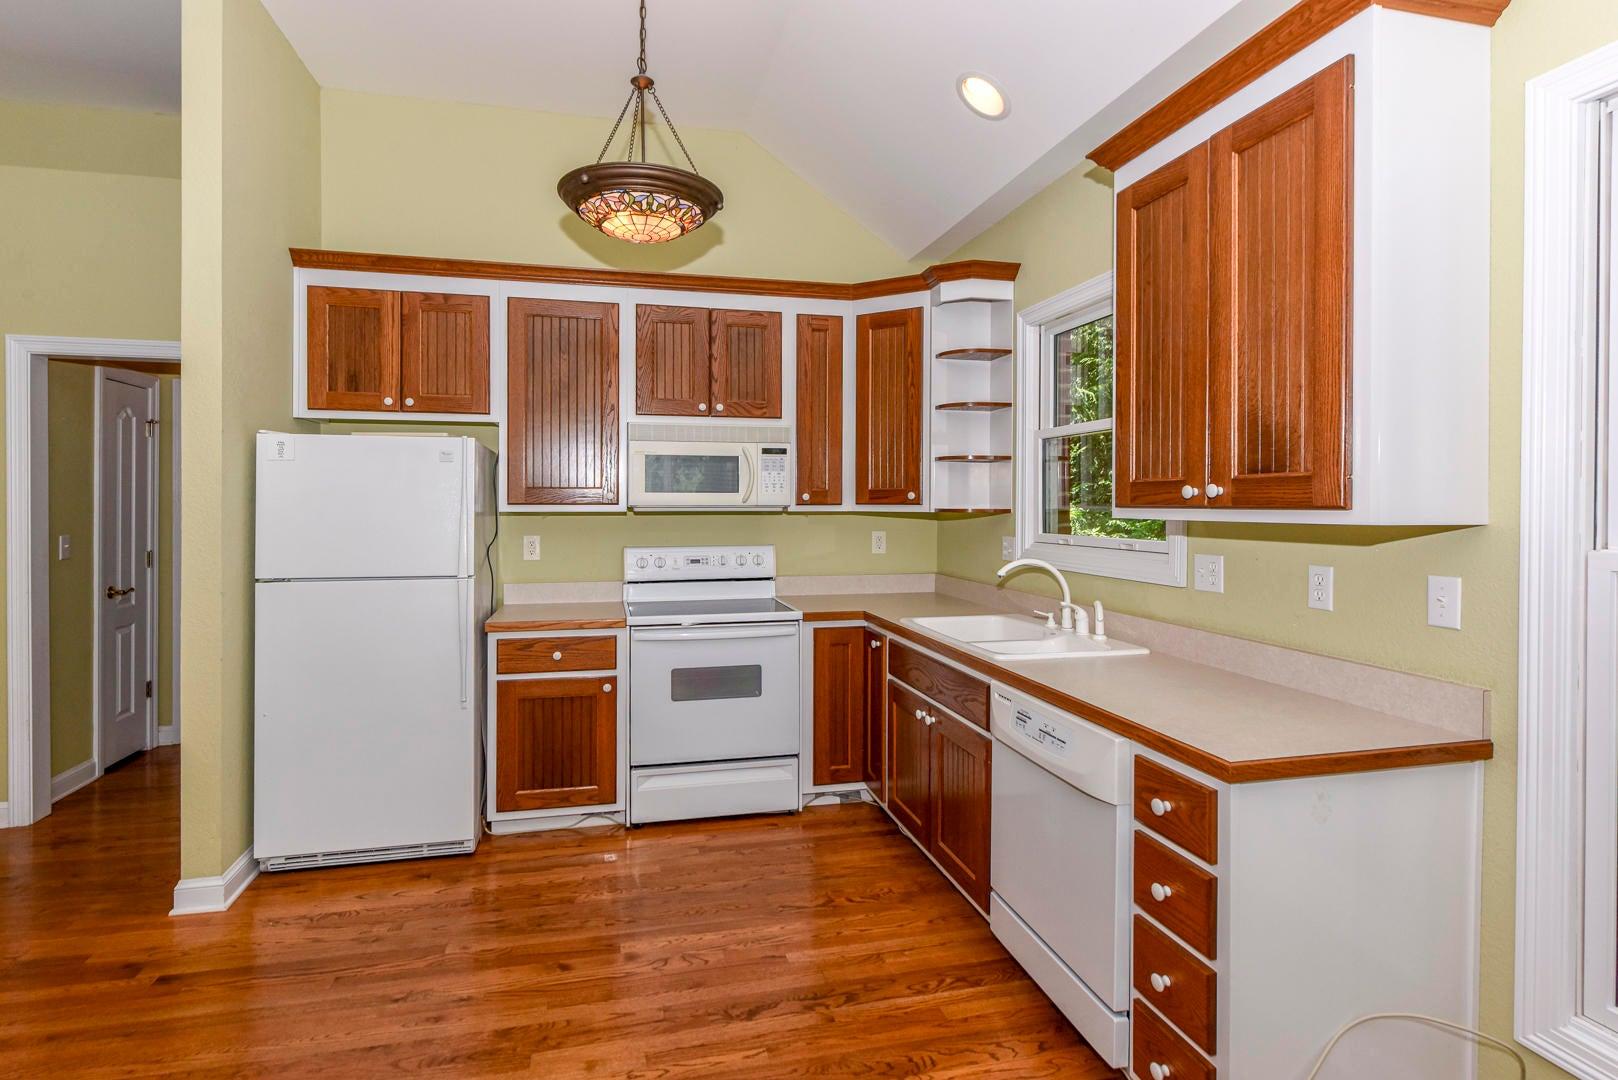 Separate Living Quarter w/ Full Kitchen